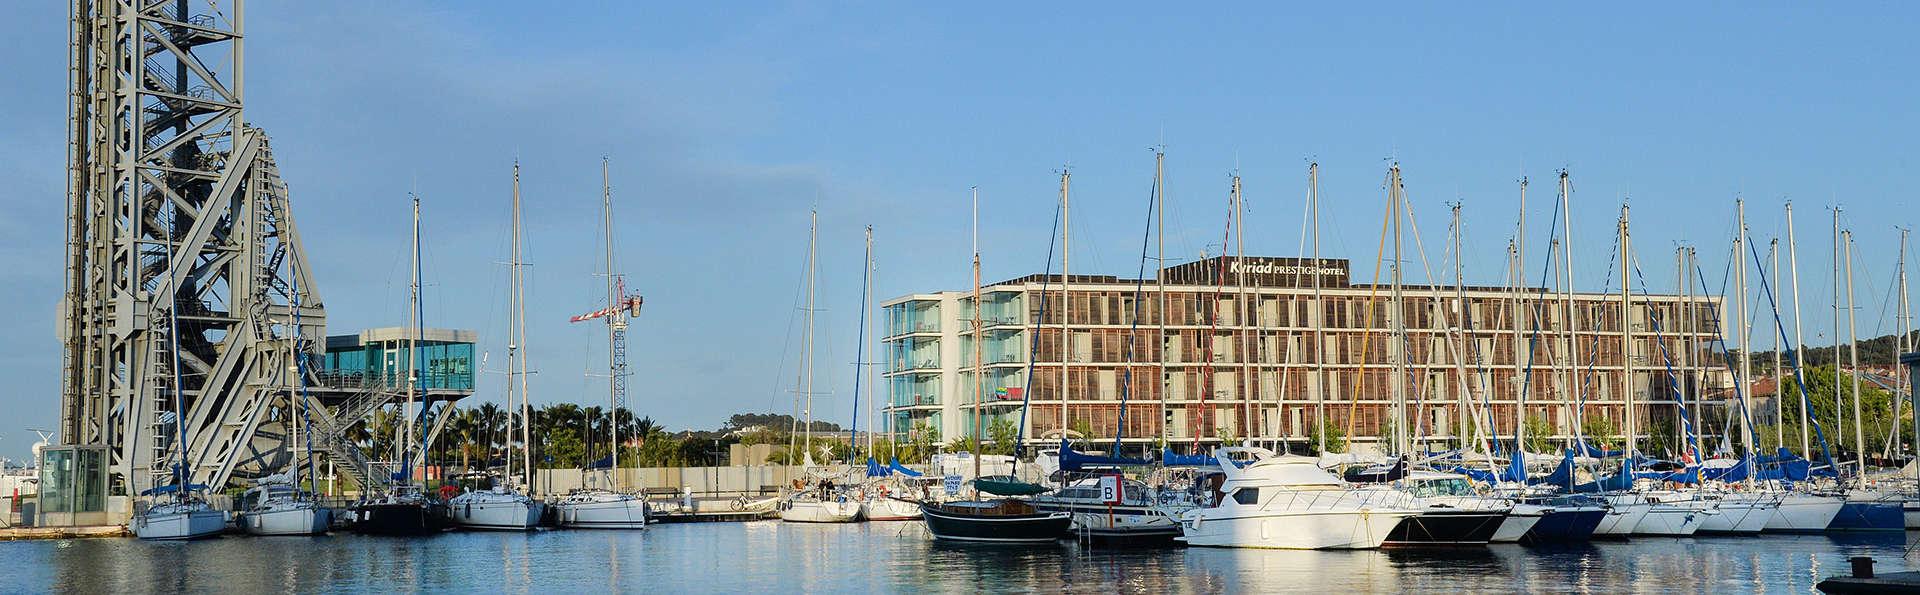 H tel kyriad prestige toulon h tel de charme la seyne sur mer for Hotels toulon